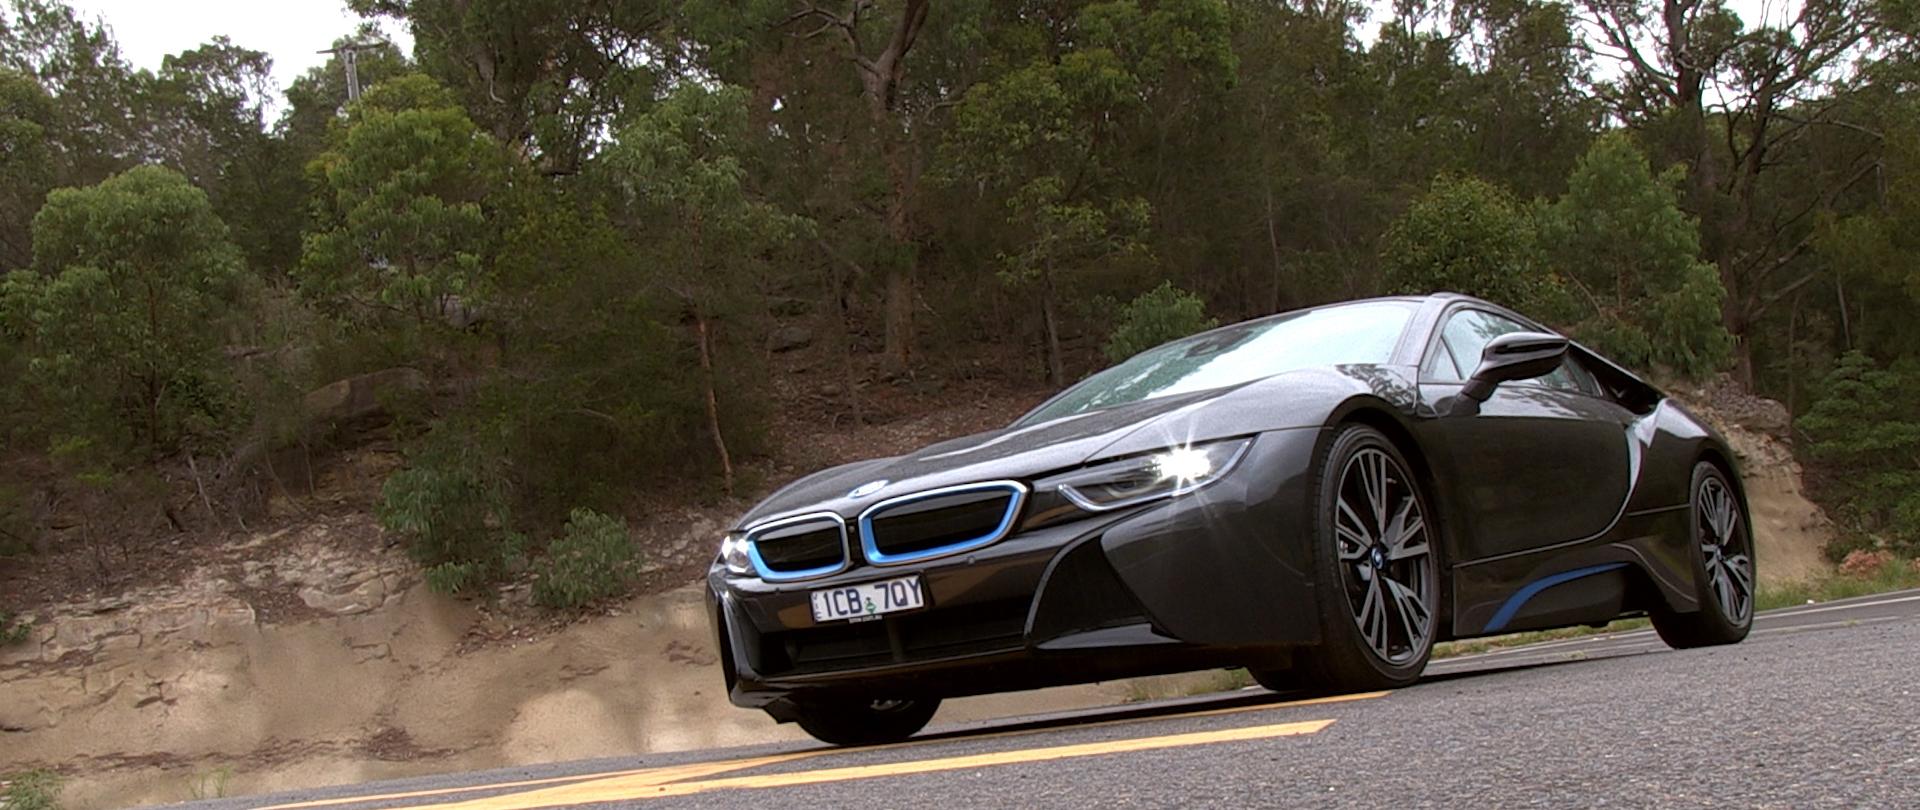 BMW i8 02.jpg